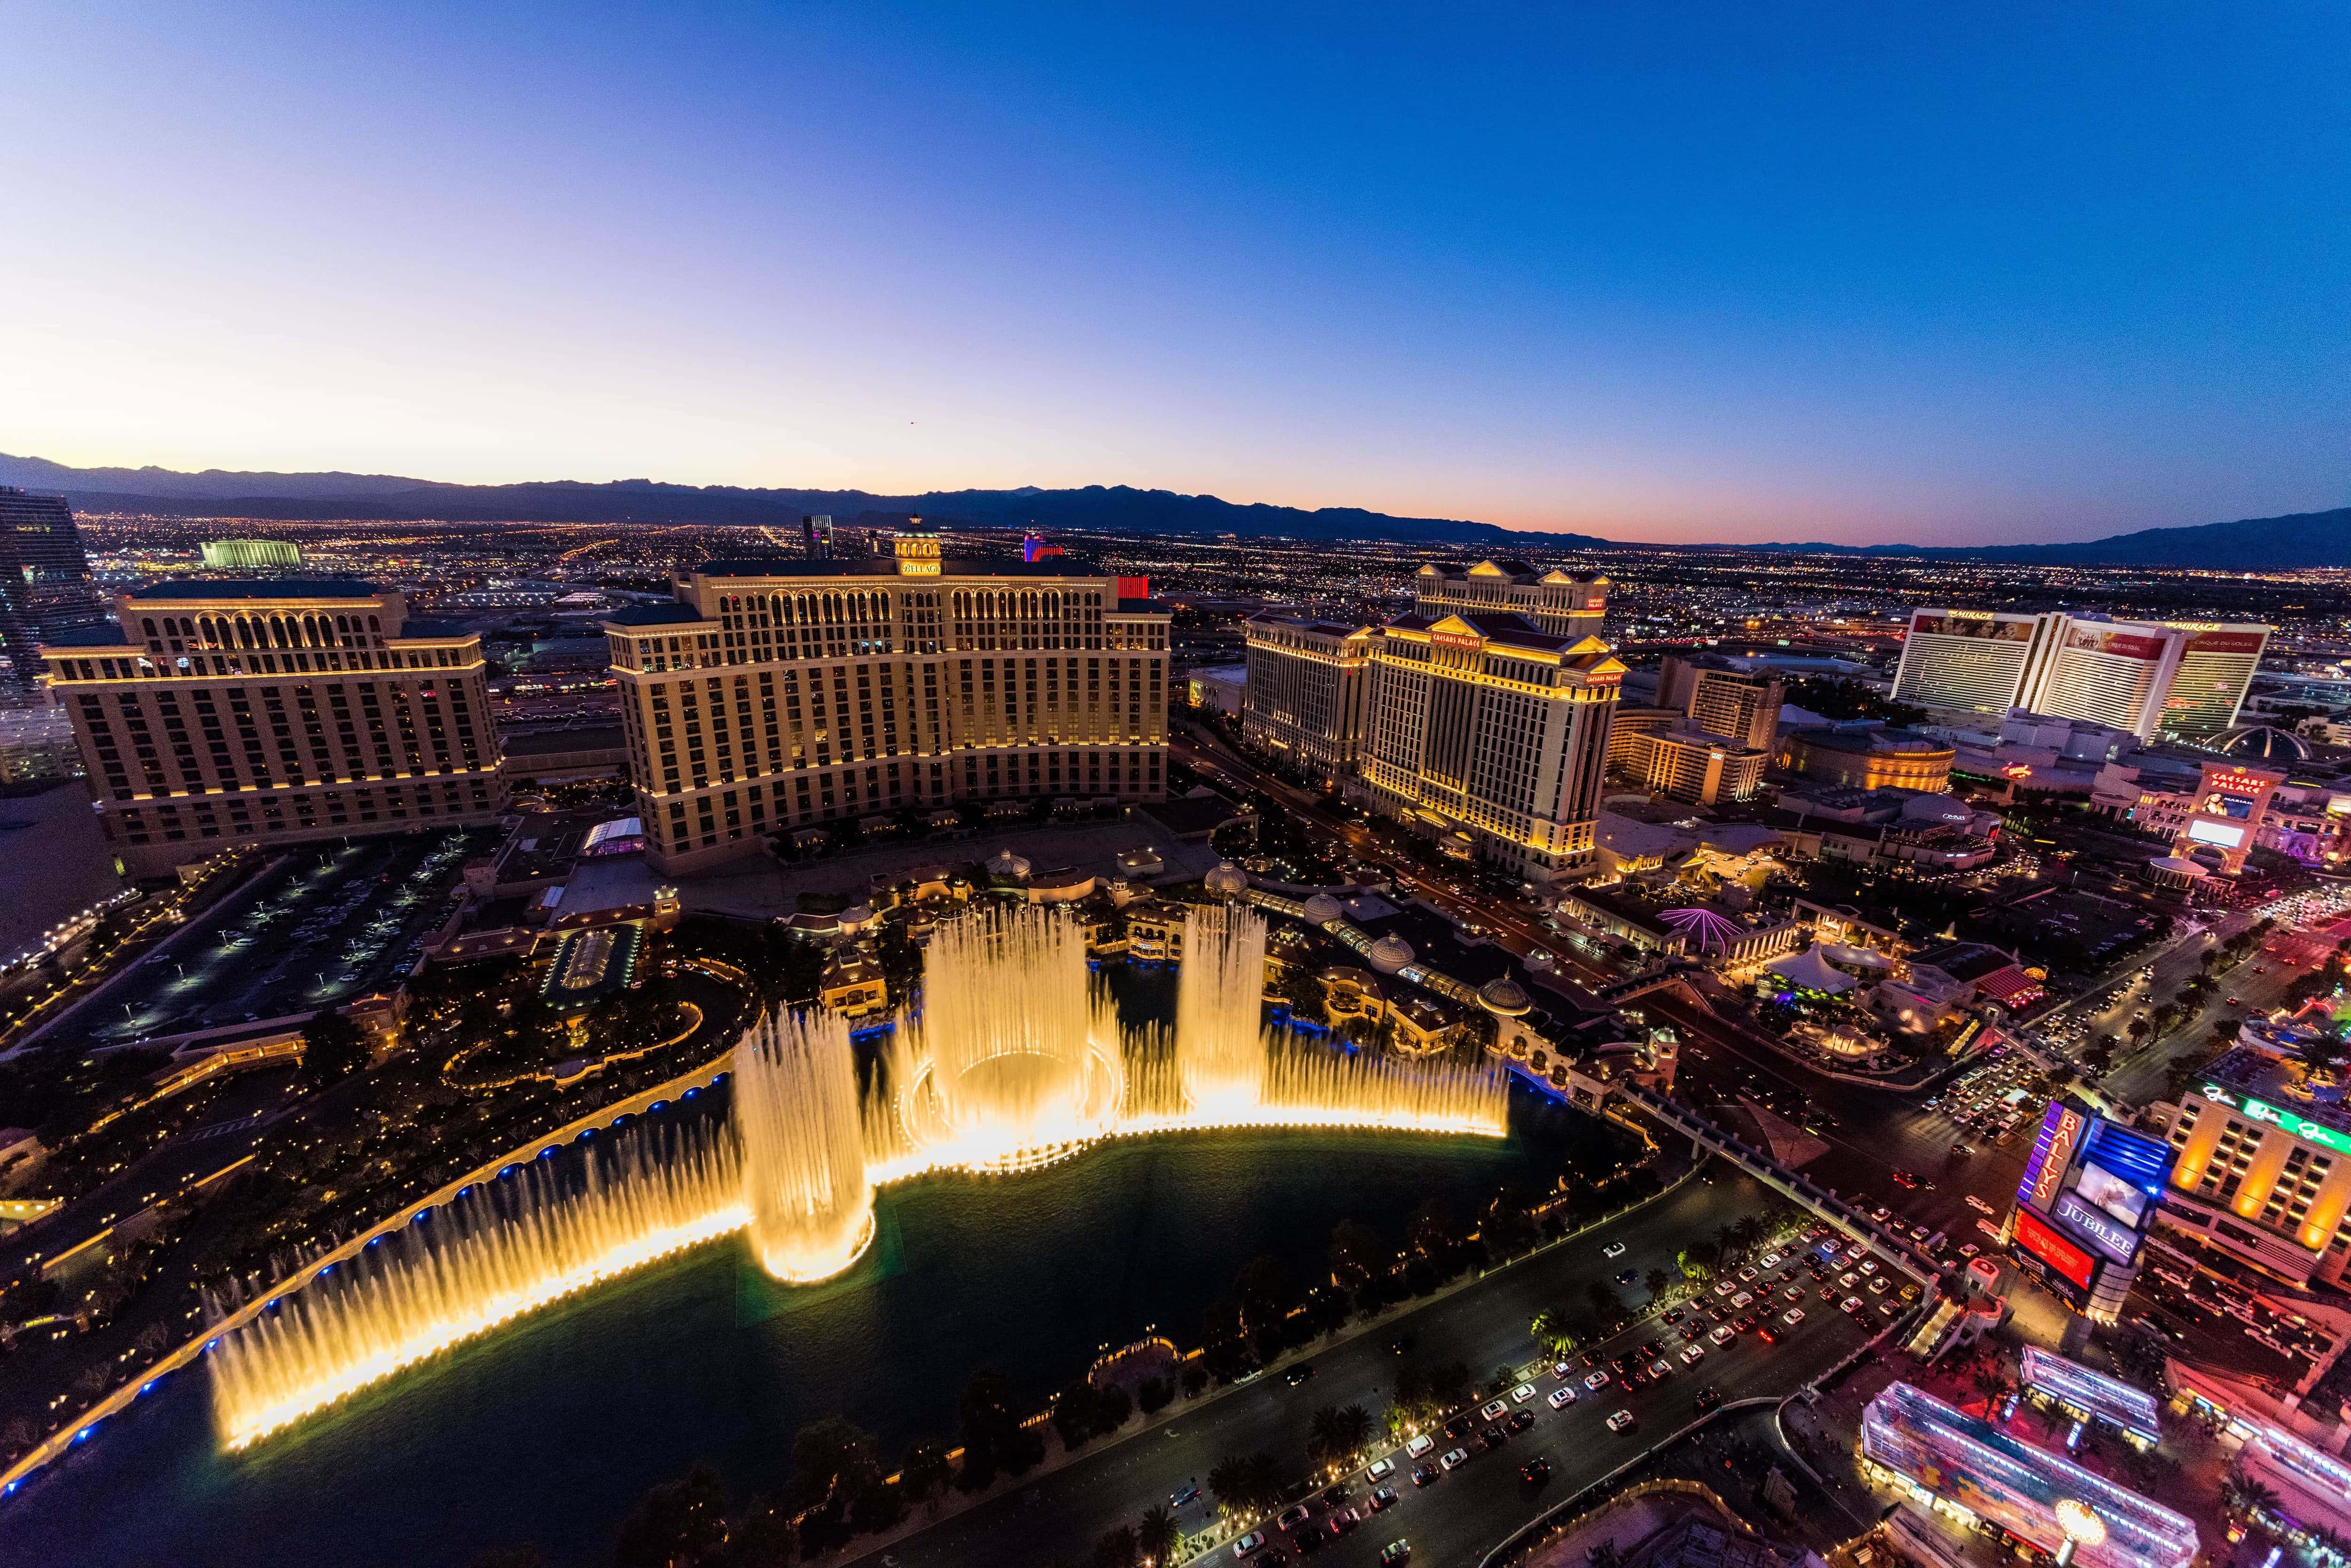 Las Vegas views from above